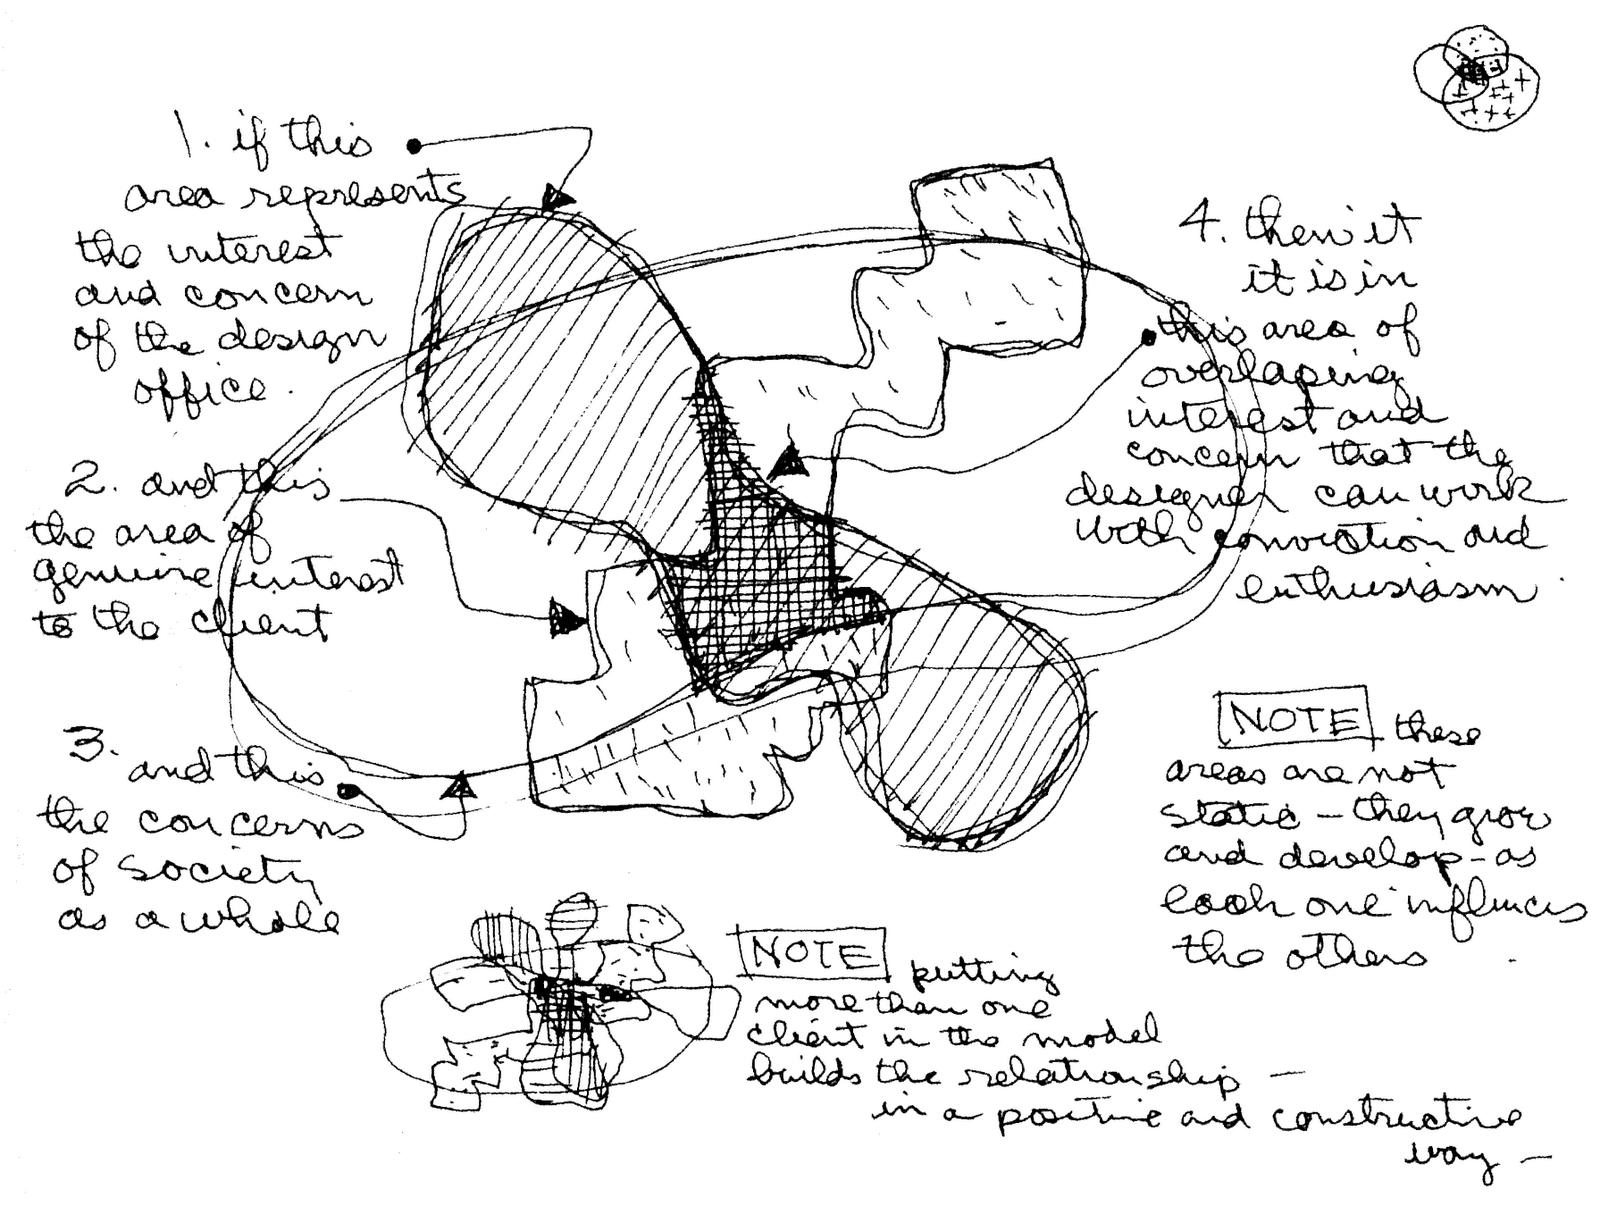 The Charles Eames Design Diagram